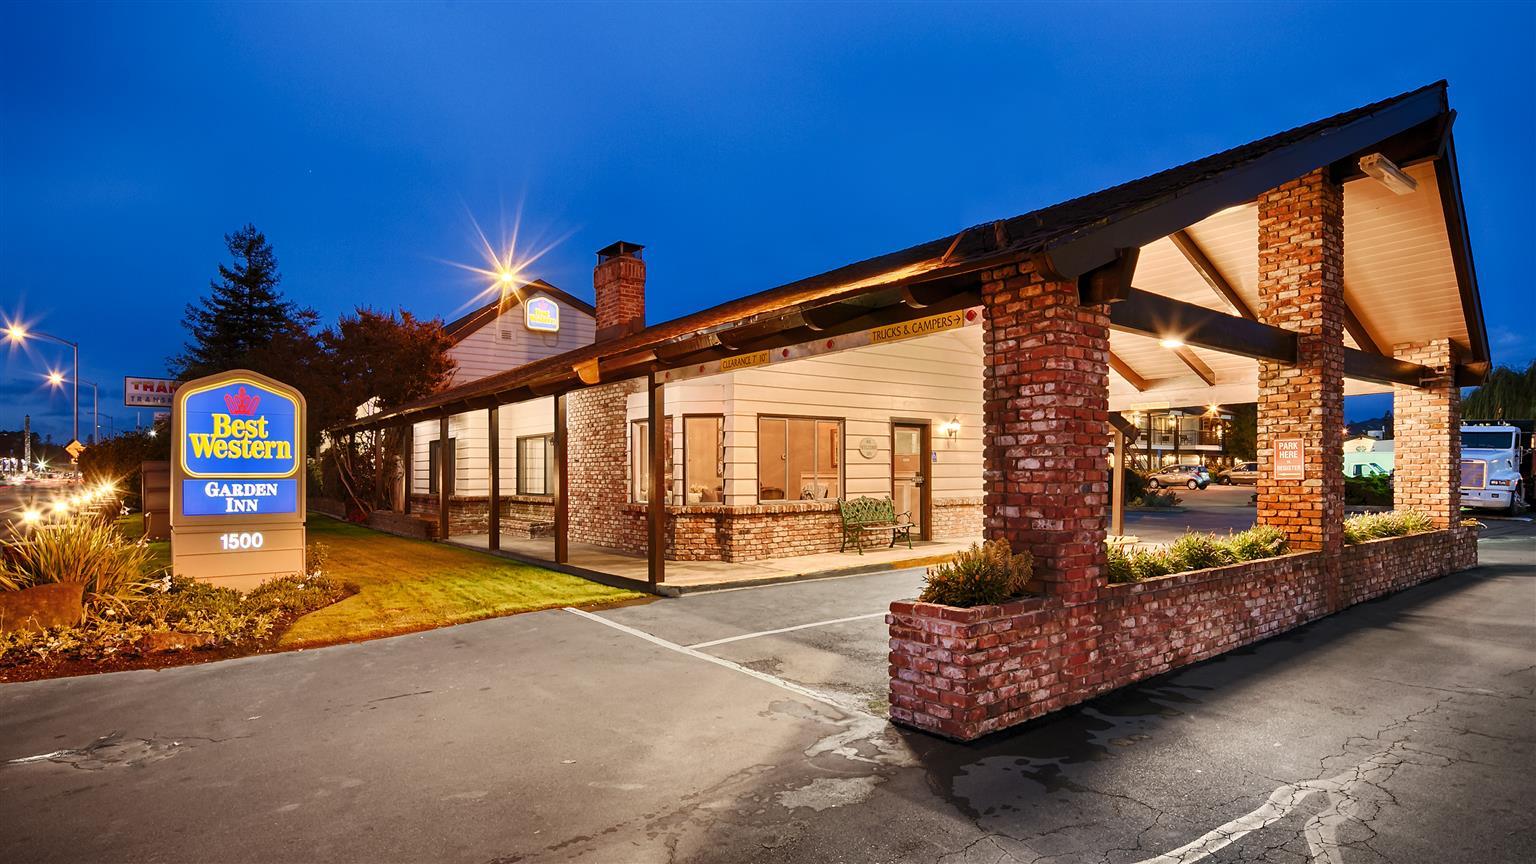 Best Western Garden Inn | Santa Rosa, California